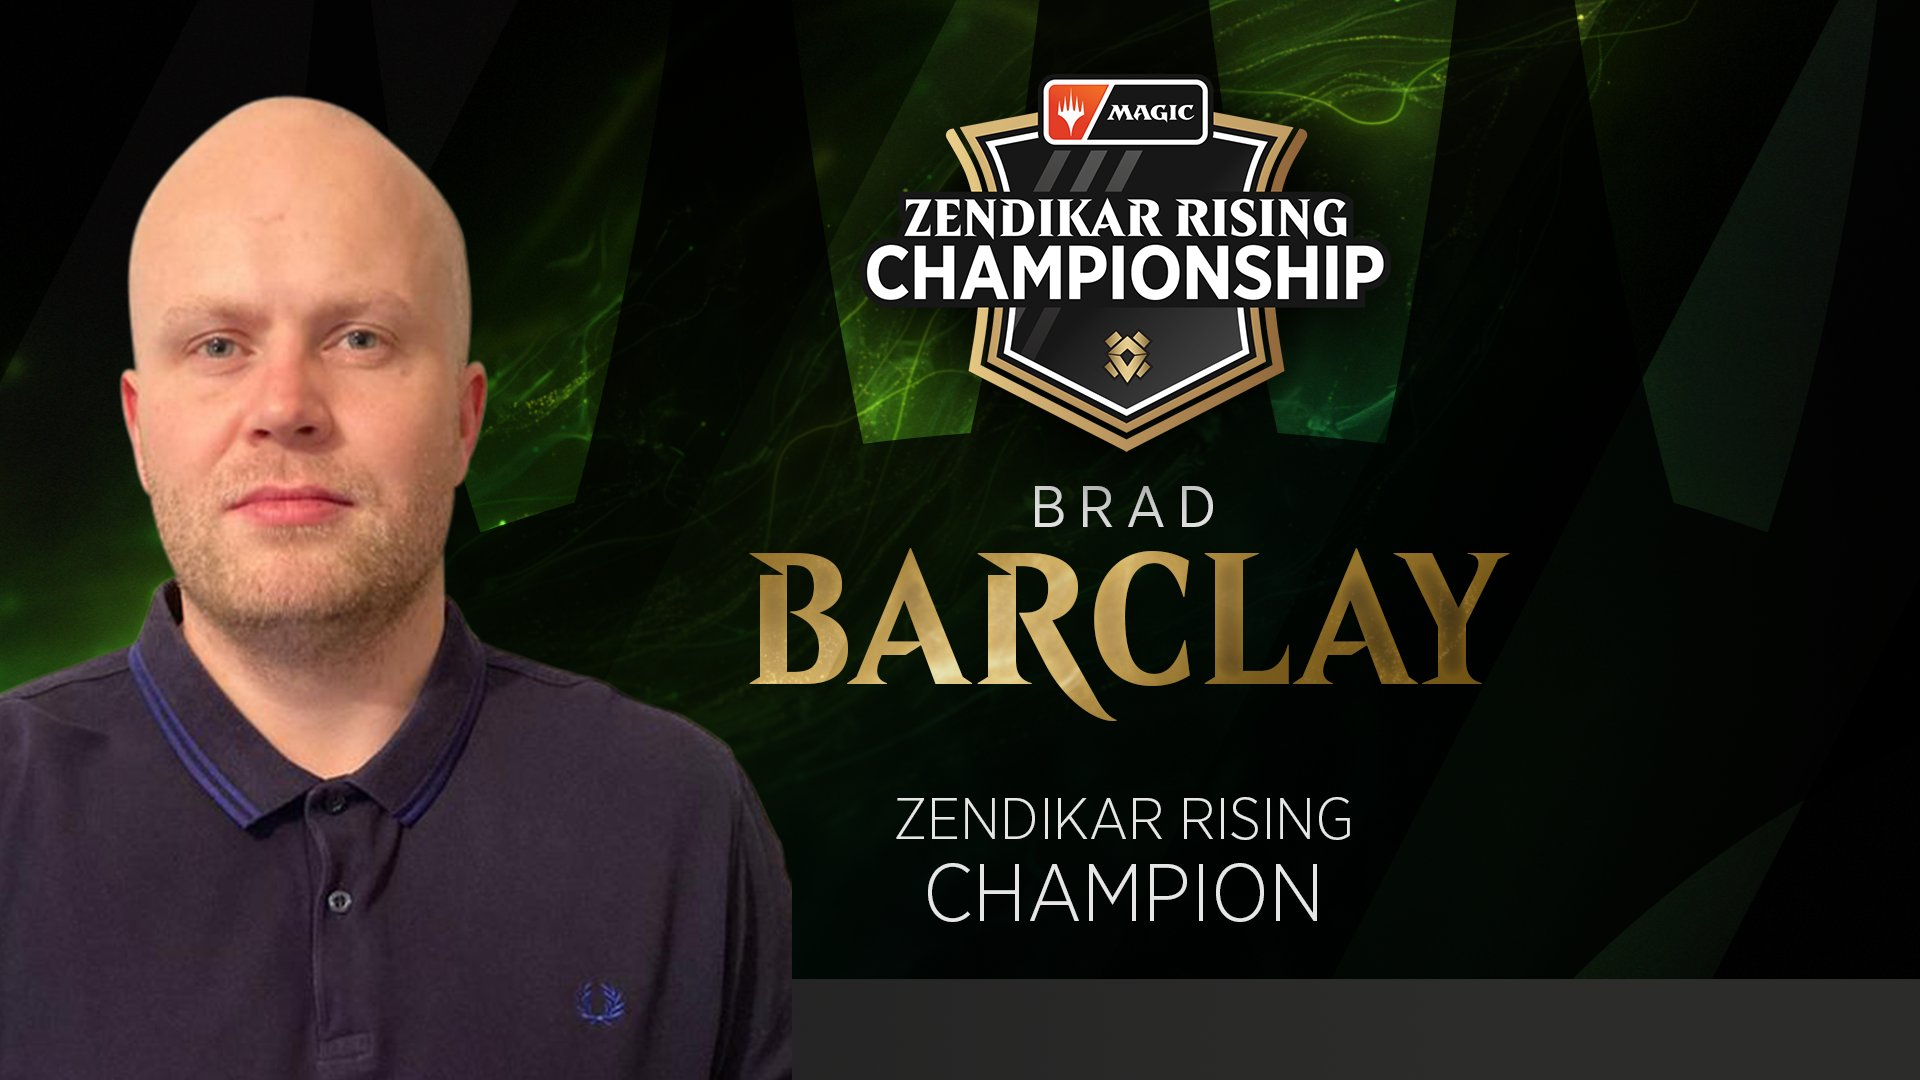 Brad Barclay Campeão